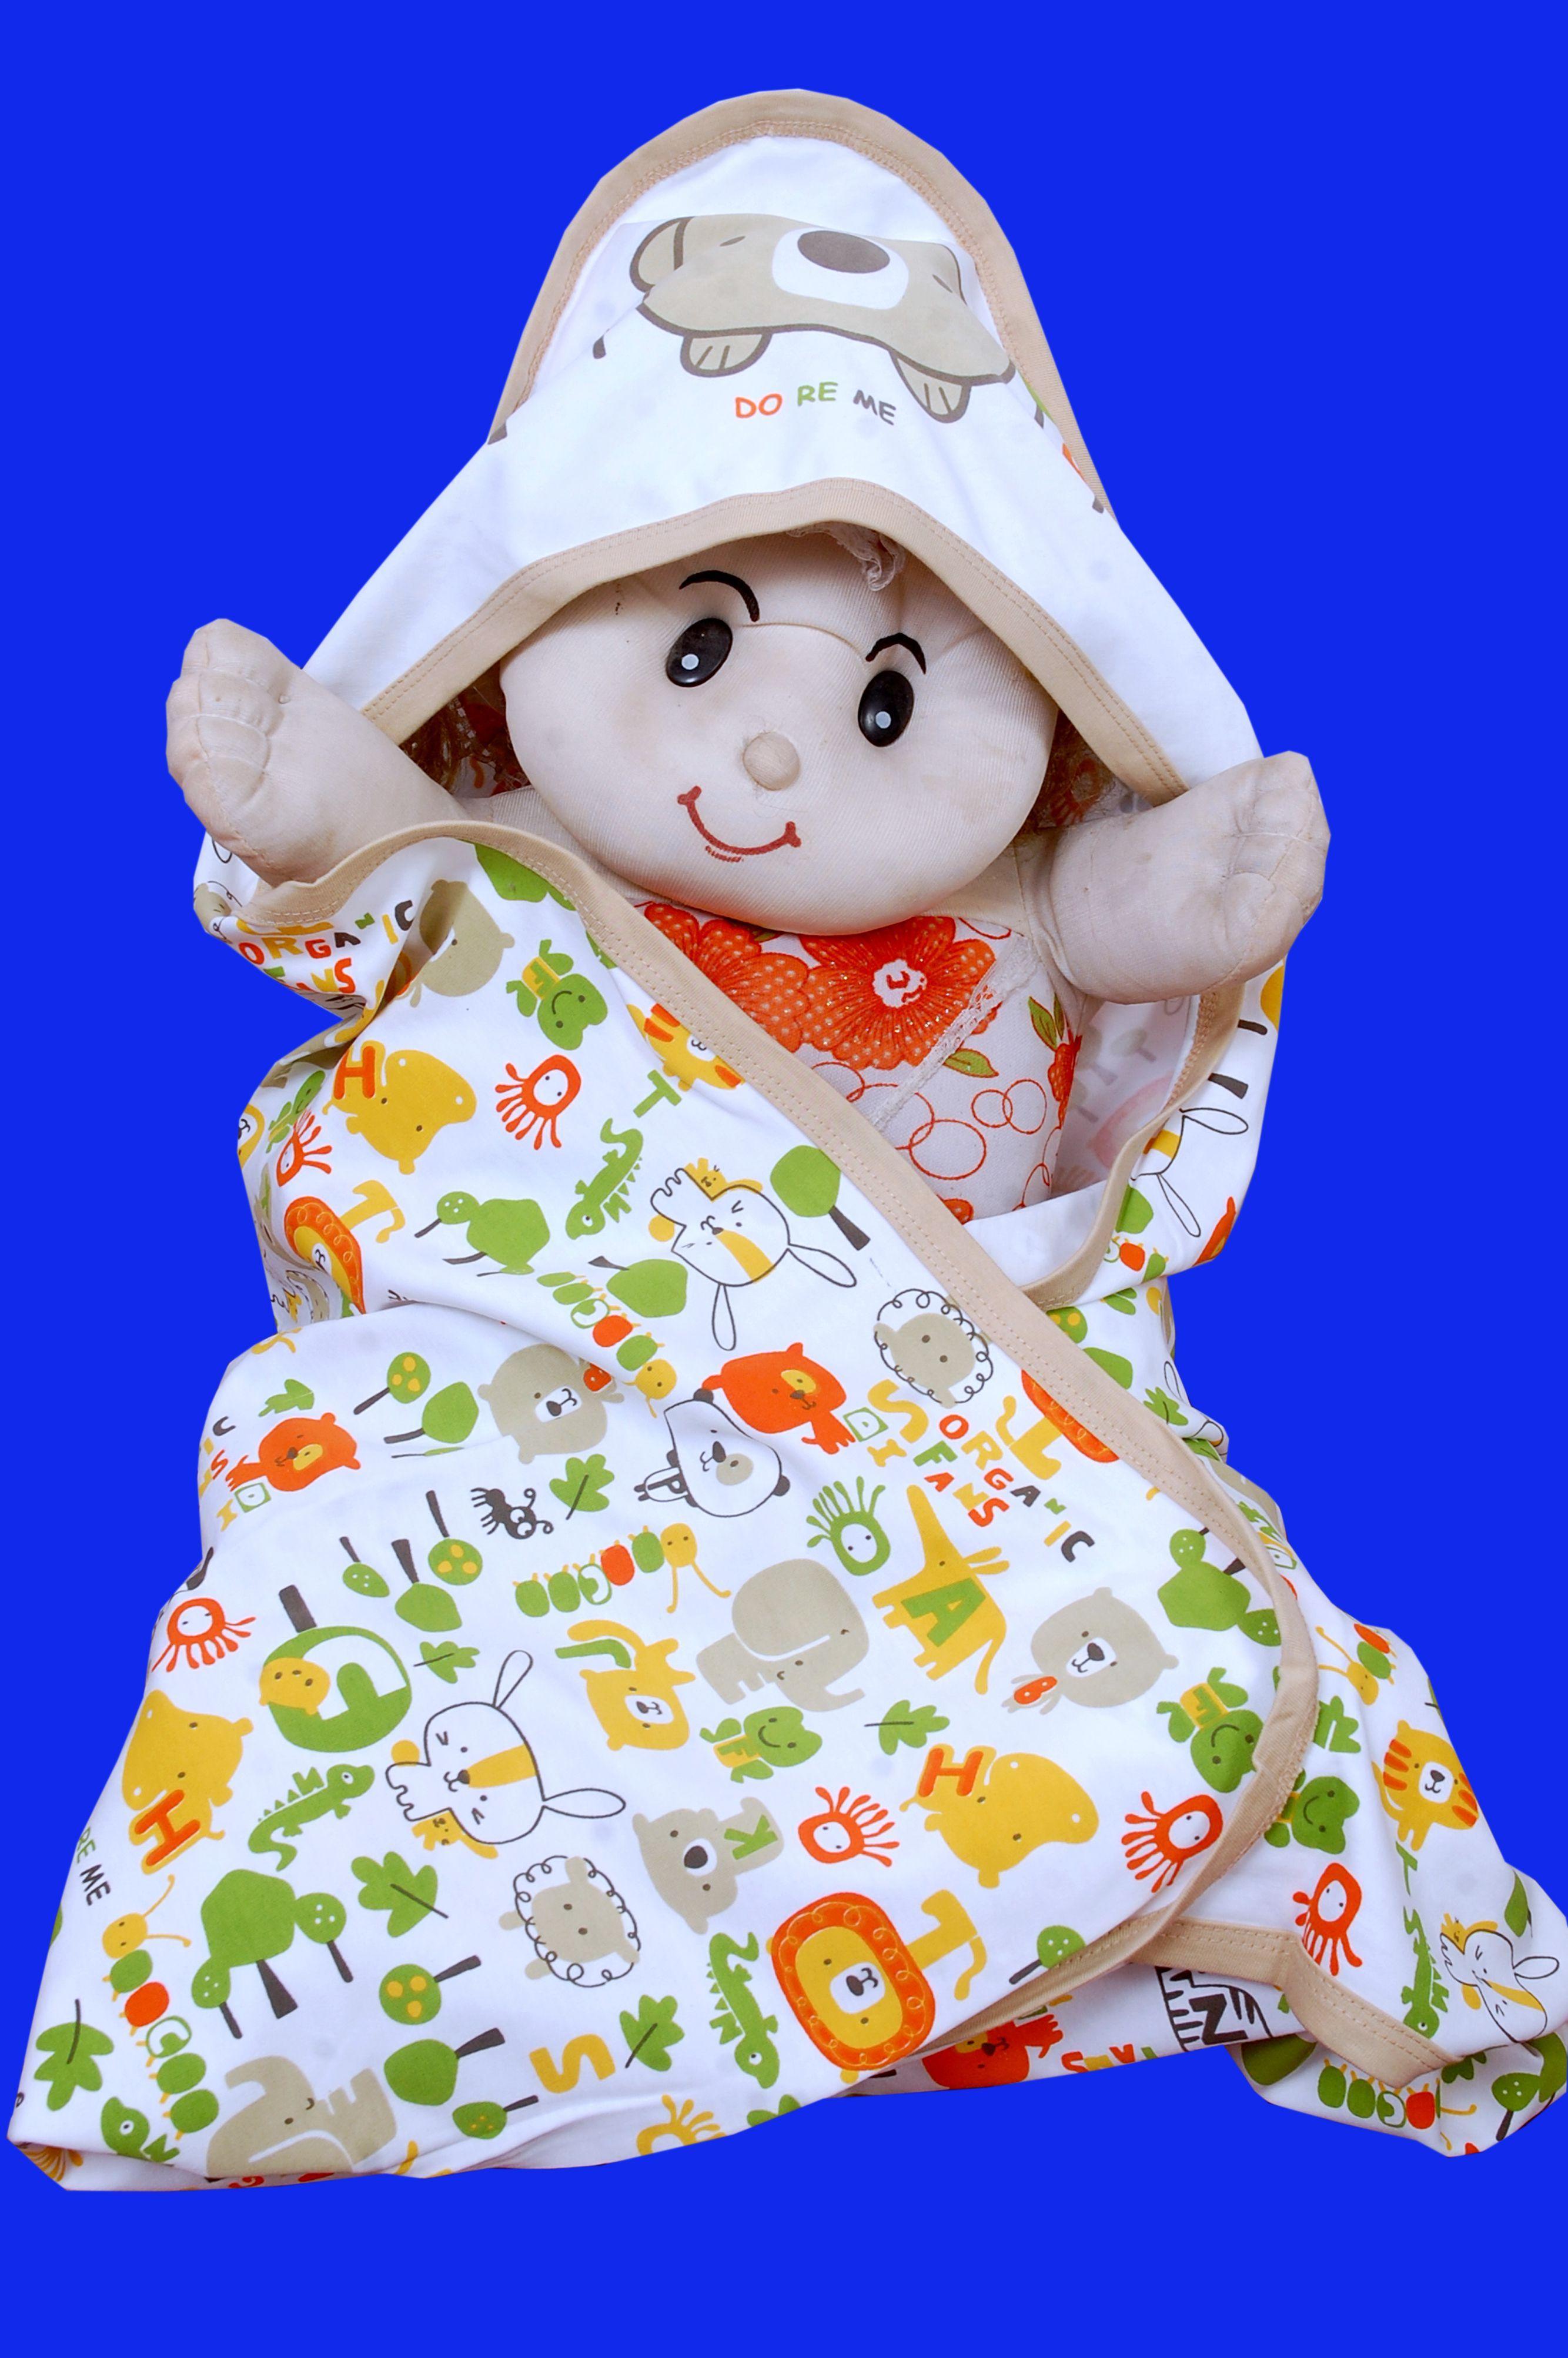 GURU KRIPA BABY PRODUCTS Multi-Colour Cotton Baby Wrap cum blanket ( 60 cm × 50 cm - 1 pcs)